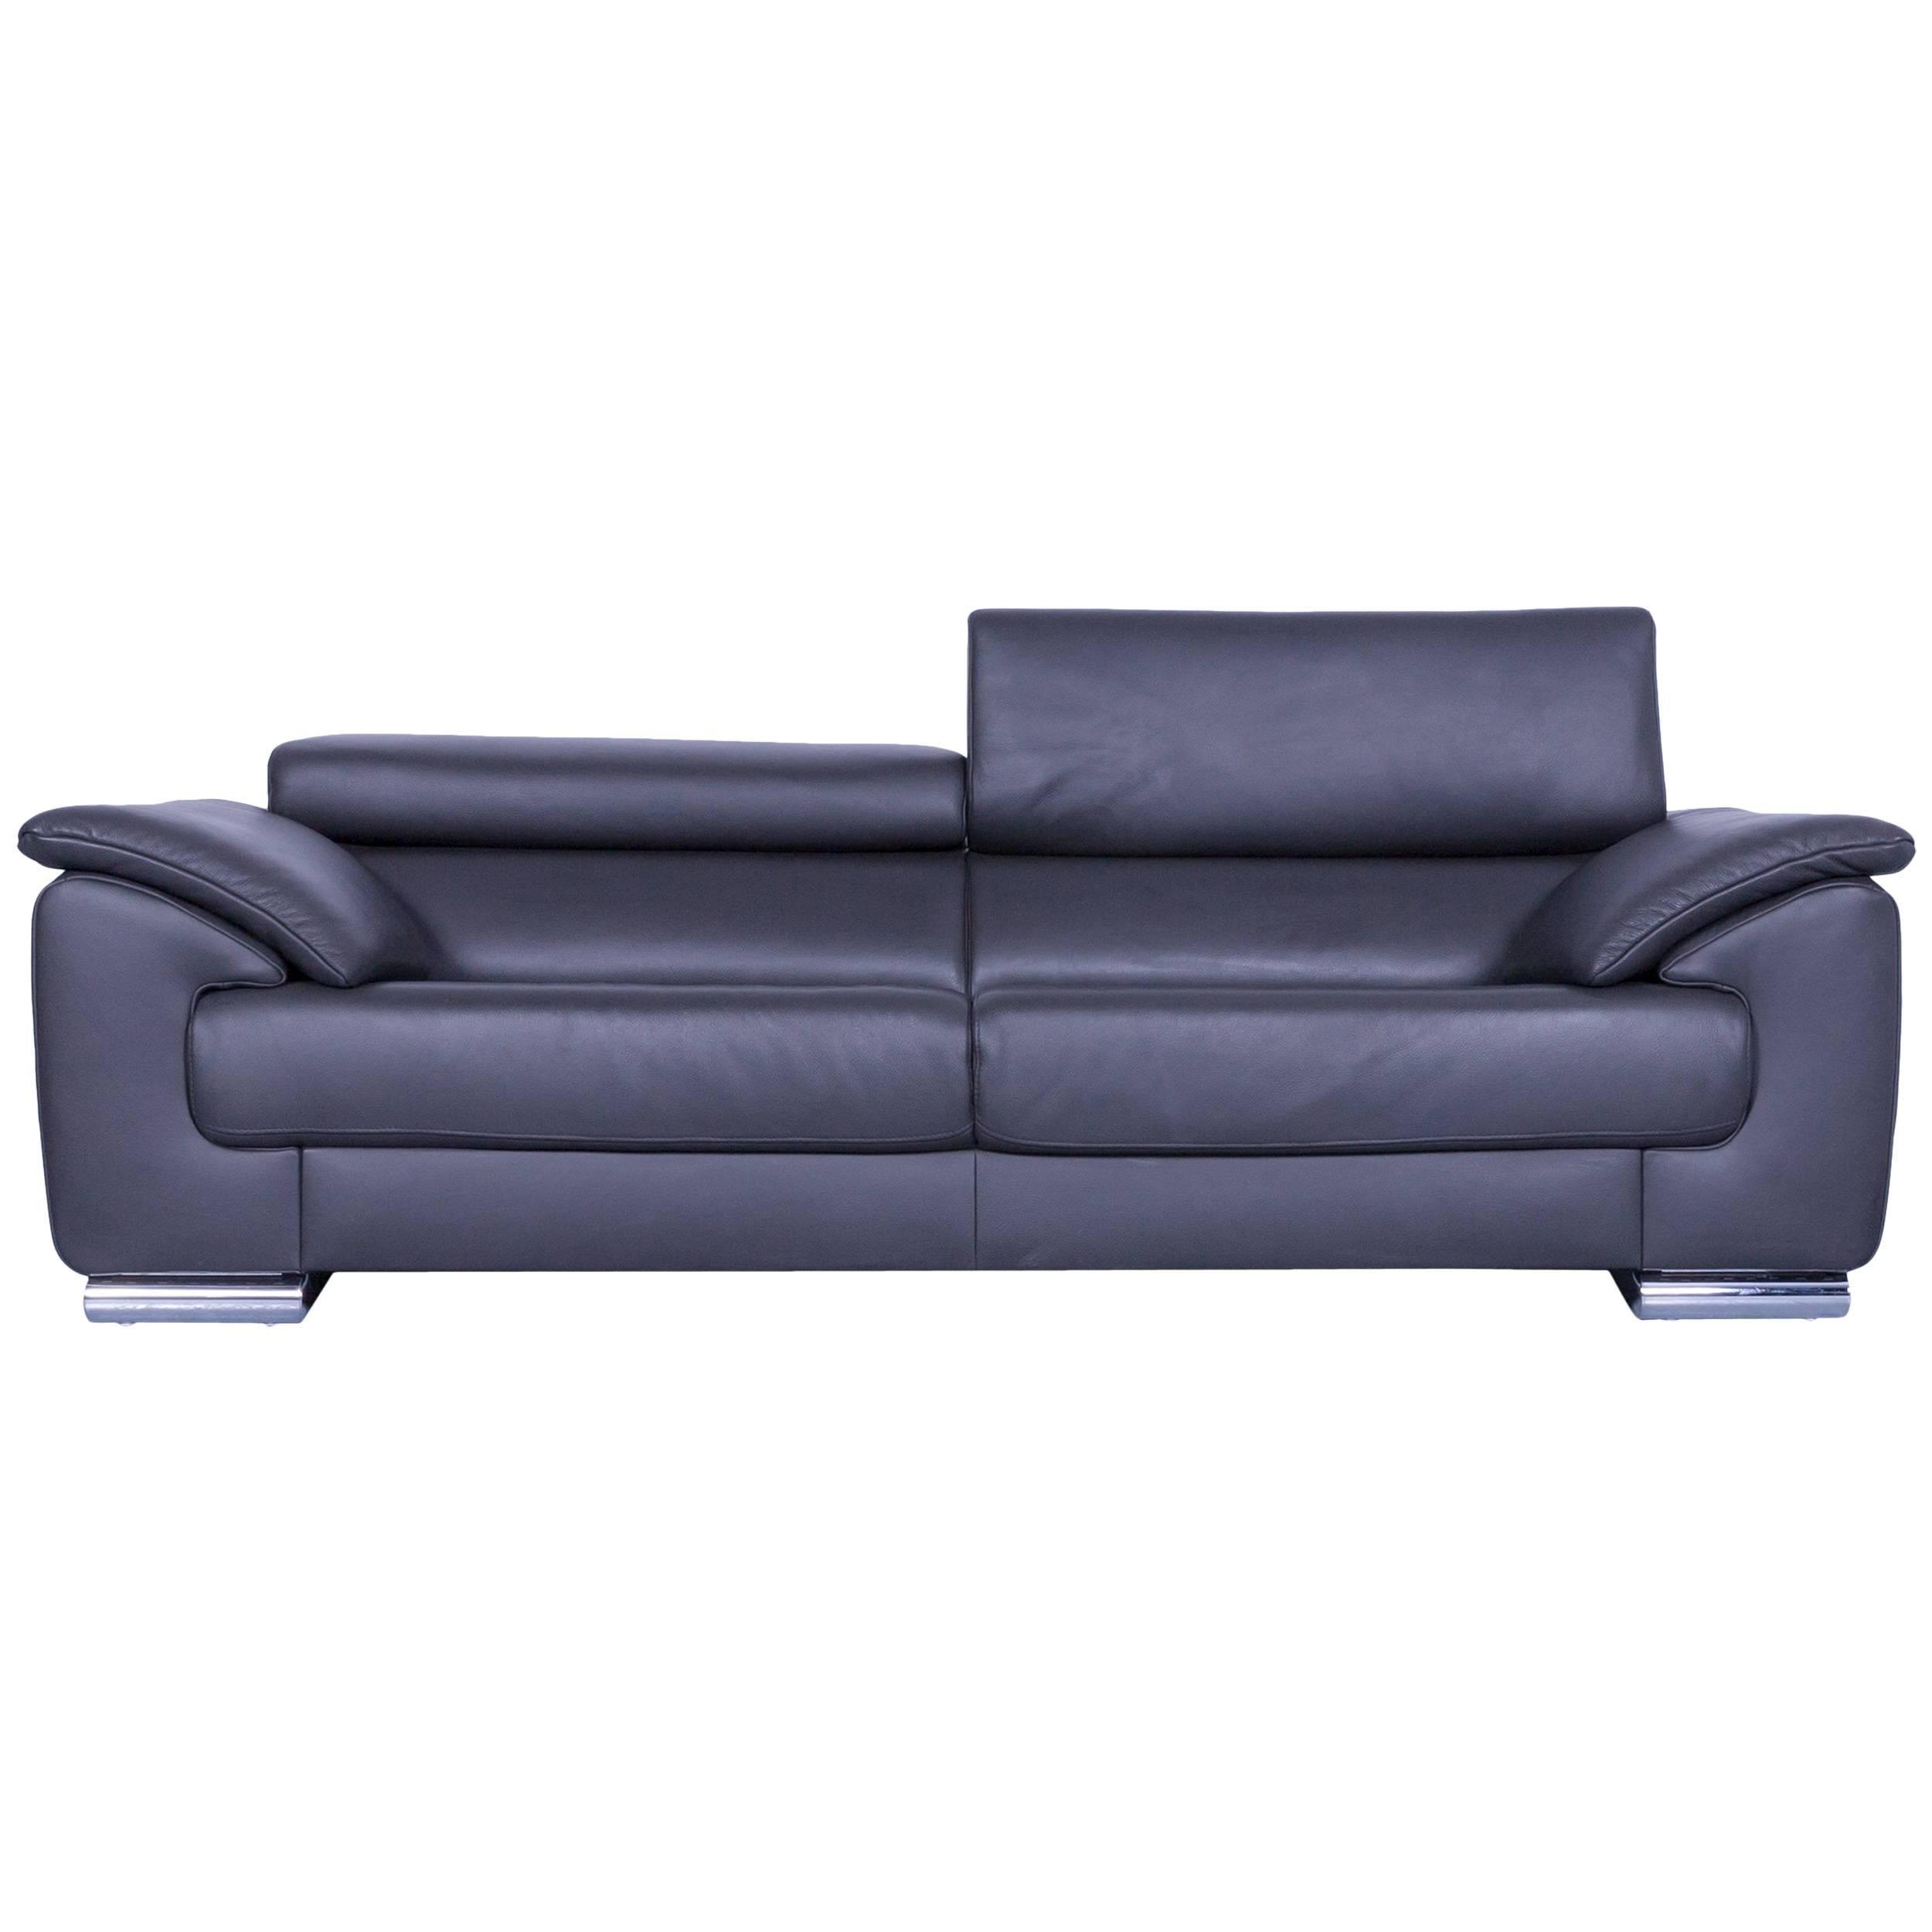 Ewald Schillig Brand Blues Designer Sofa Anthracite Dark Grey Leather Couch  For Sale